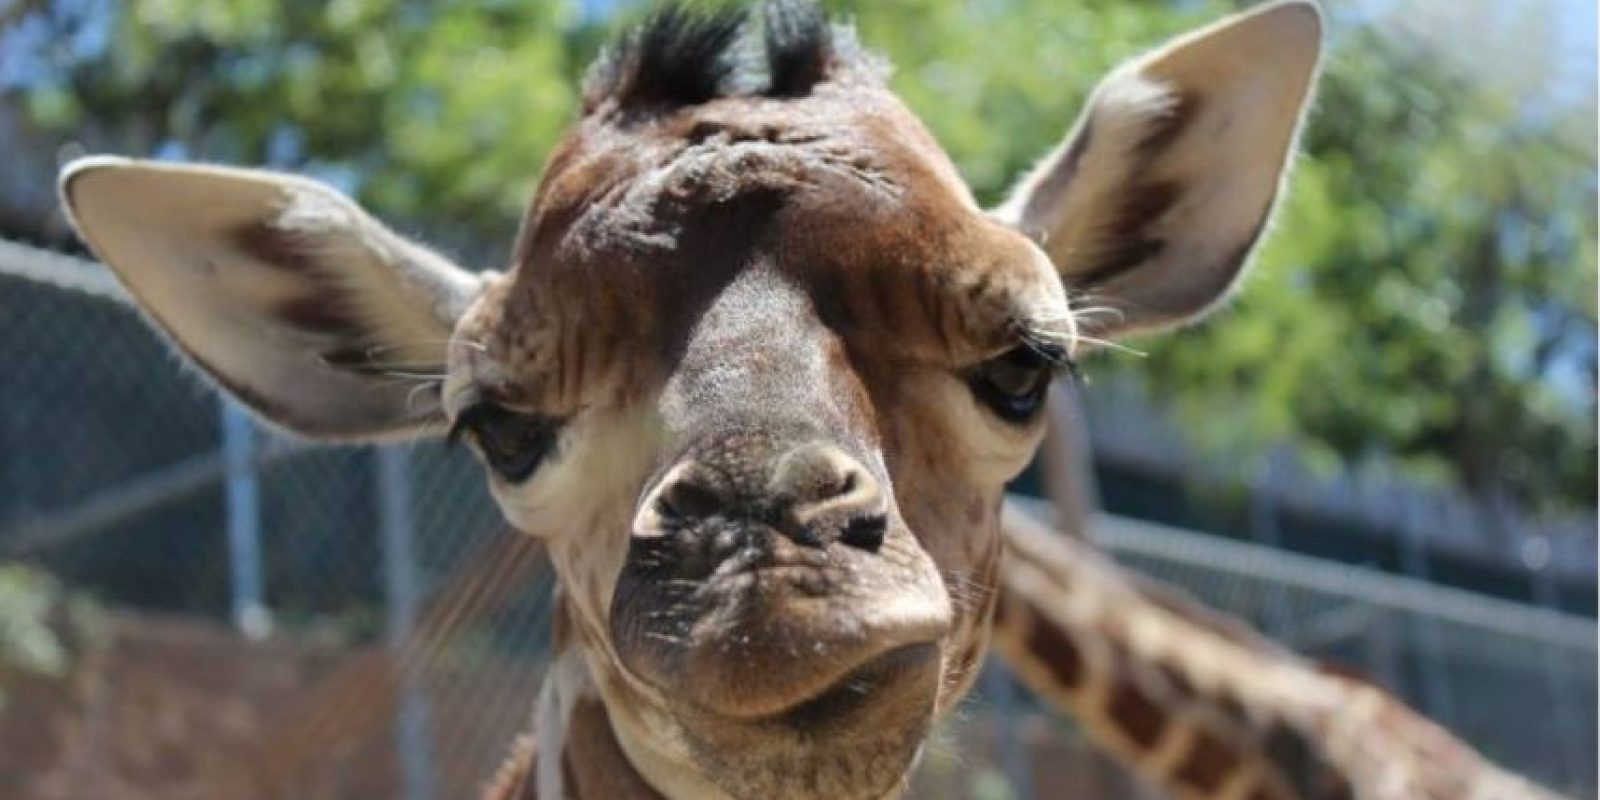 Kipenzi tenía 3 meses de nacida. Foto:Vía facebook.com/DallasZoo